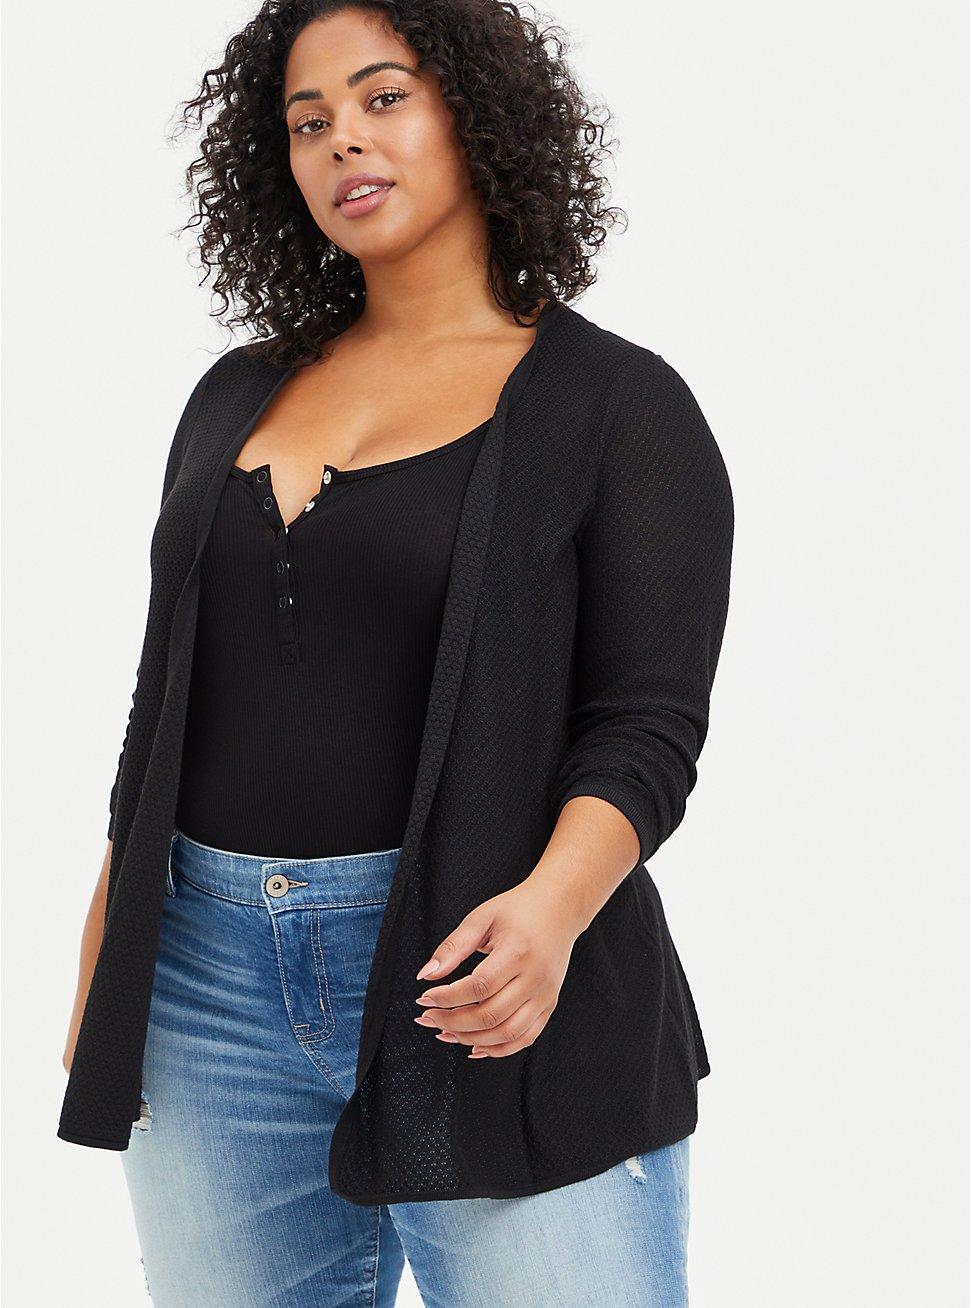 Plus Size Open Cardigan Sweater - Black, DEEP BLACK, hi-res